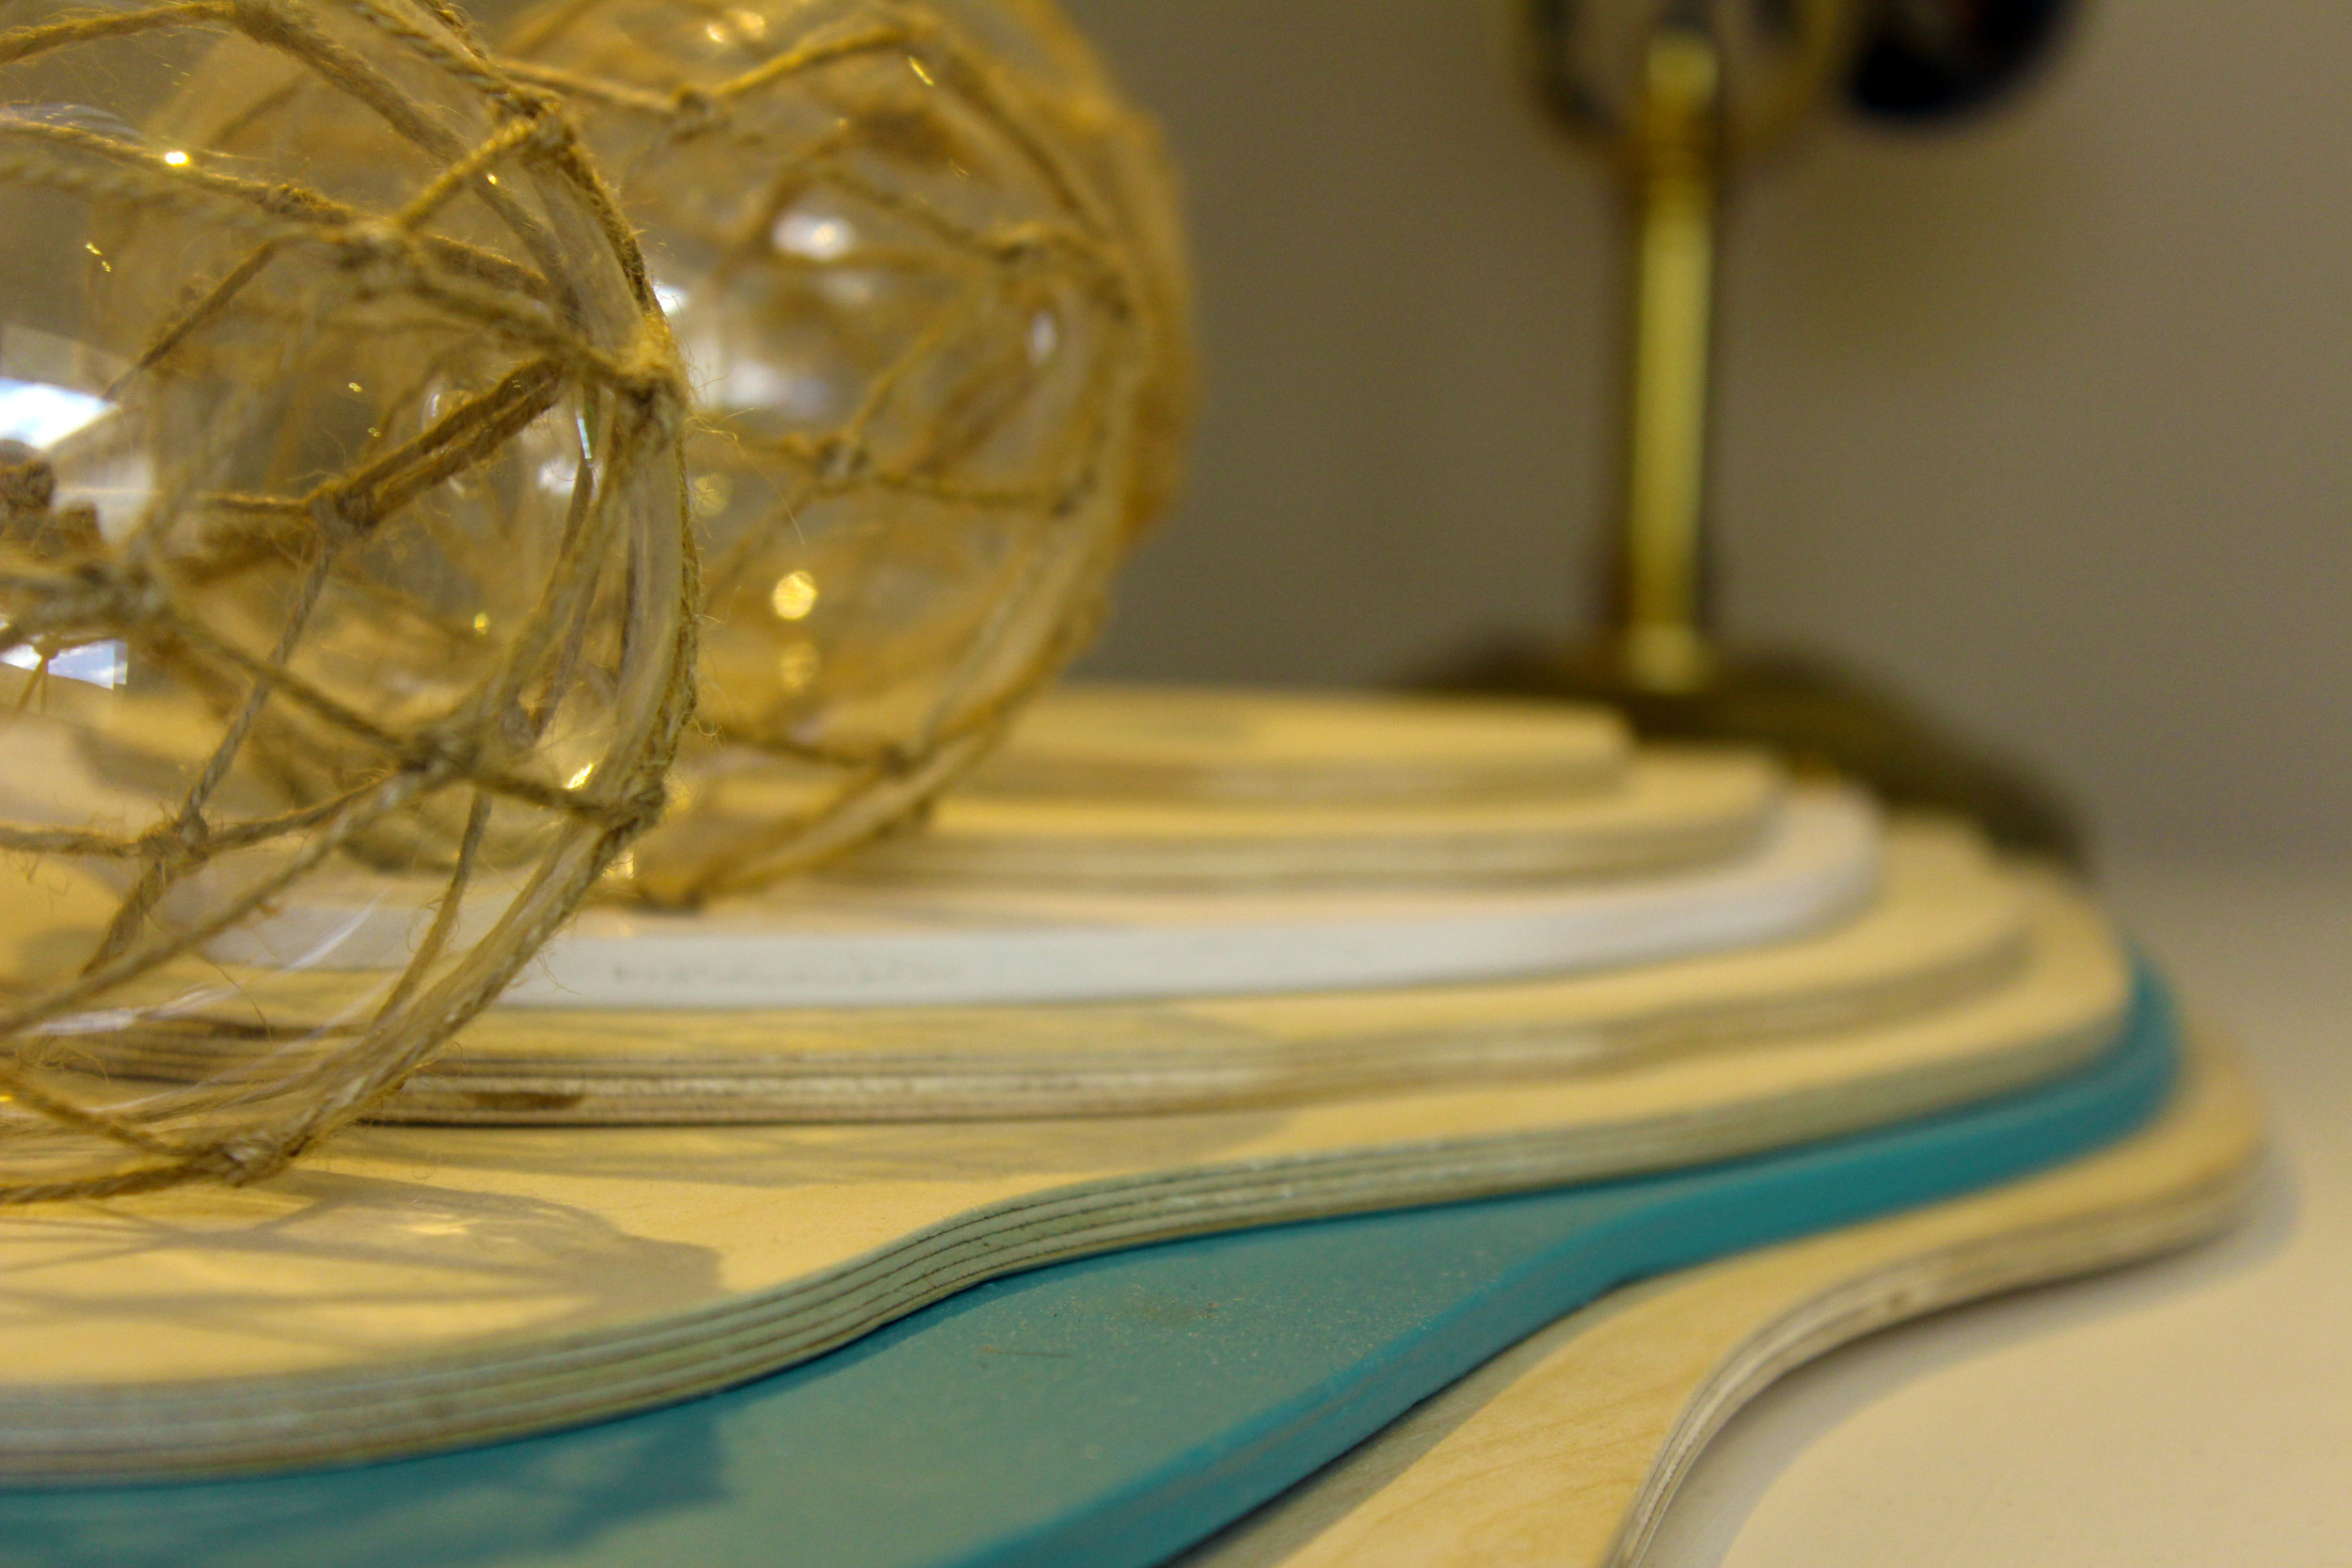 Ascent Centerpiece - FORREST designs